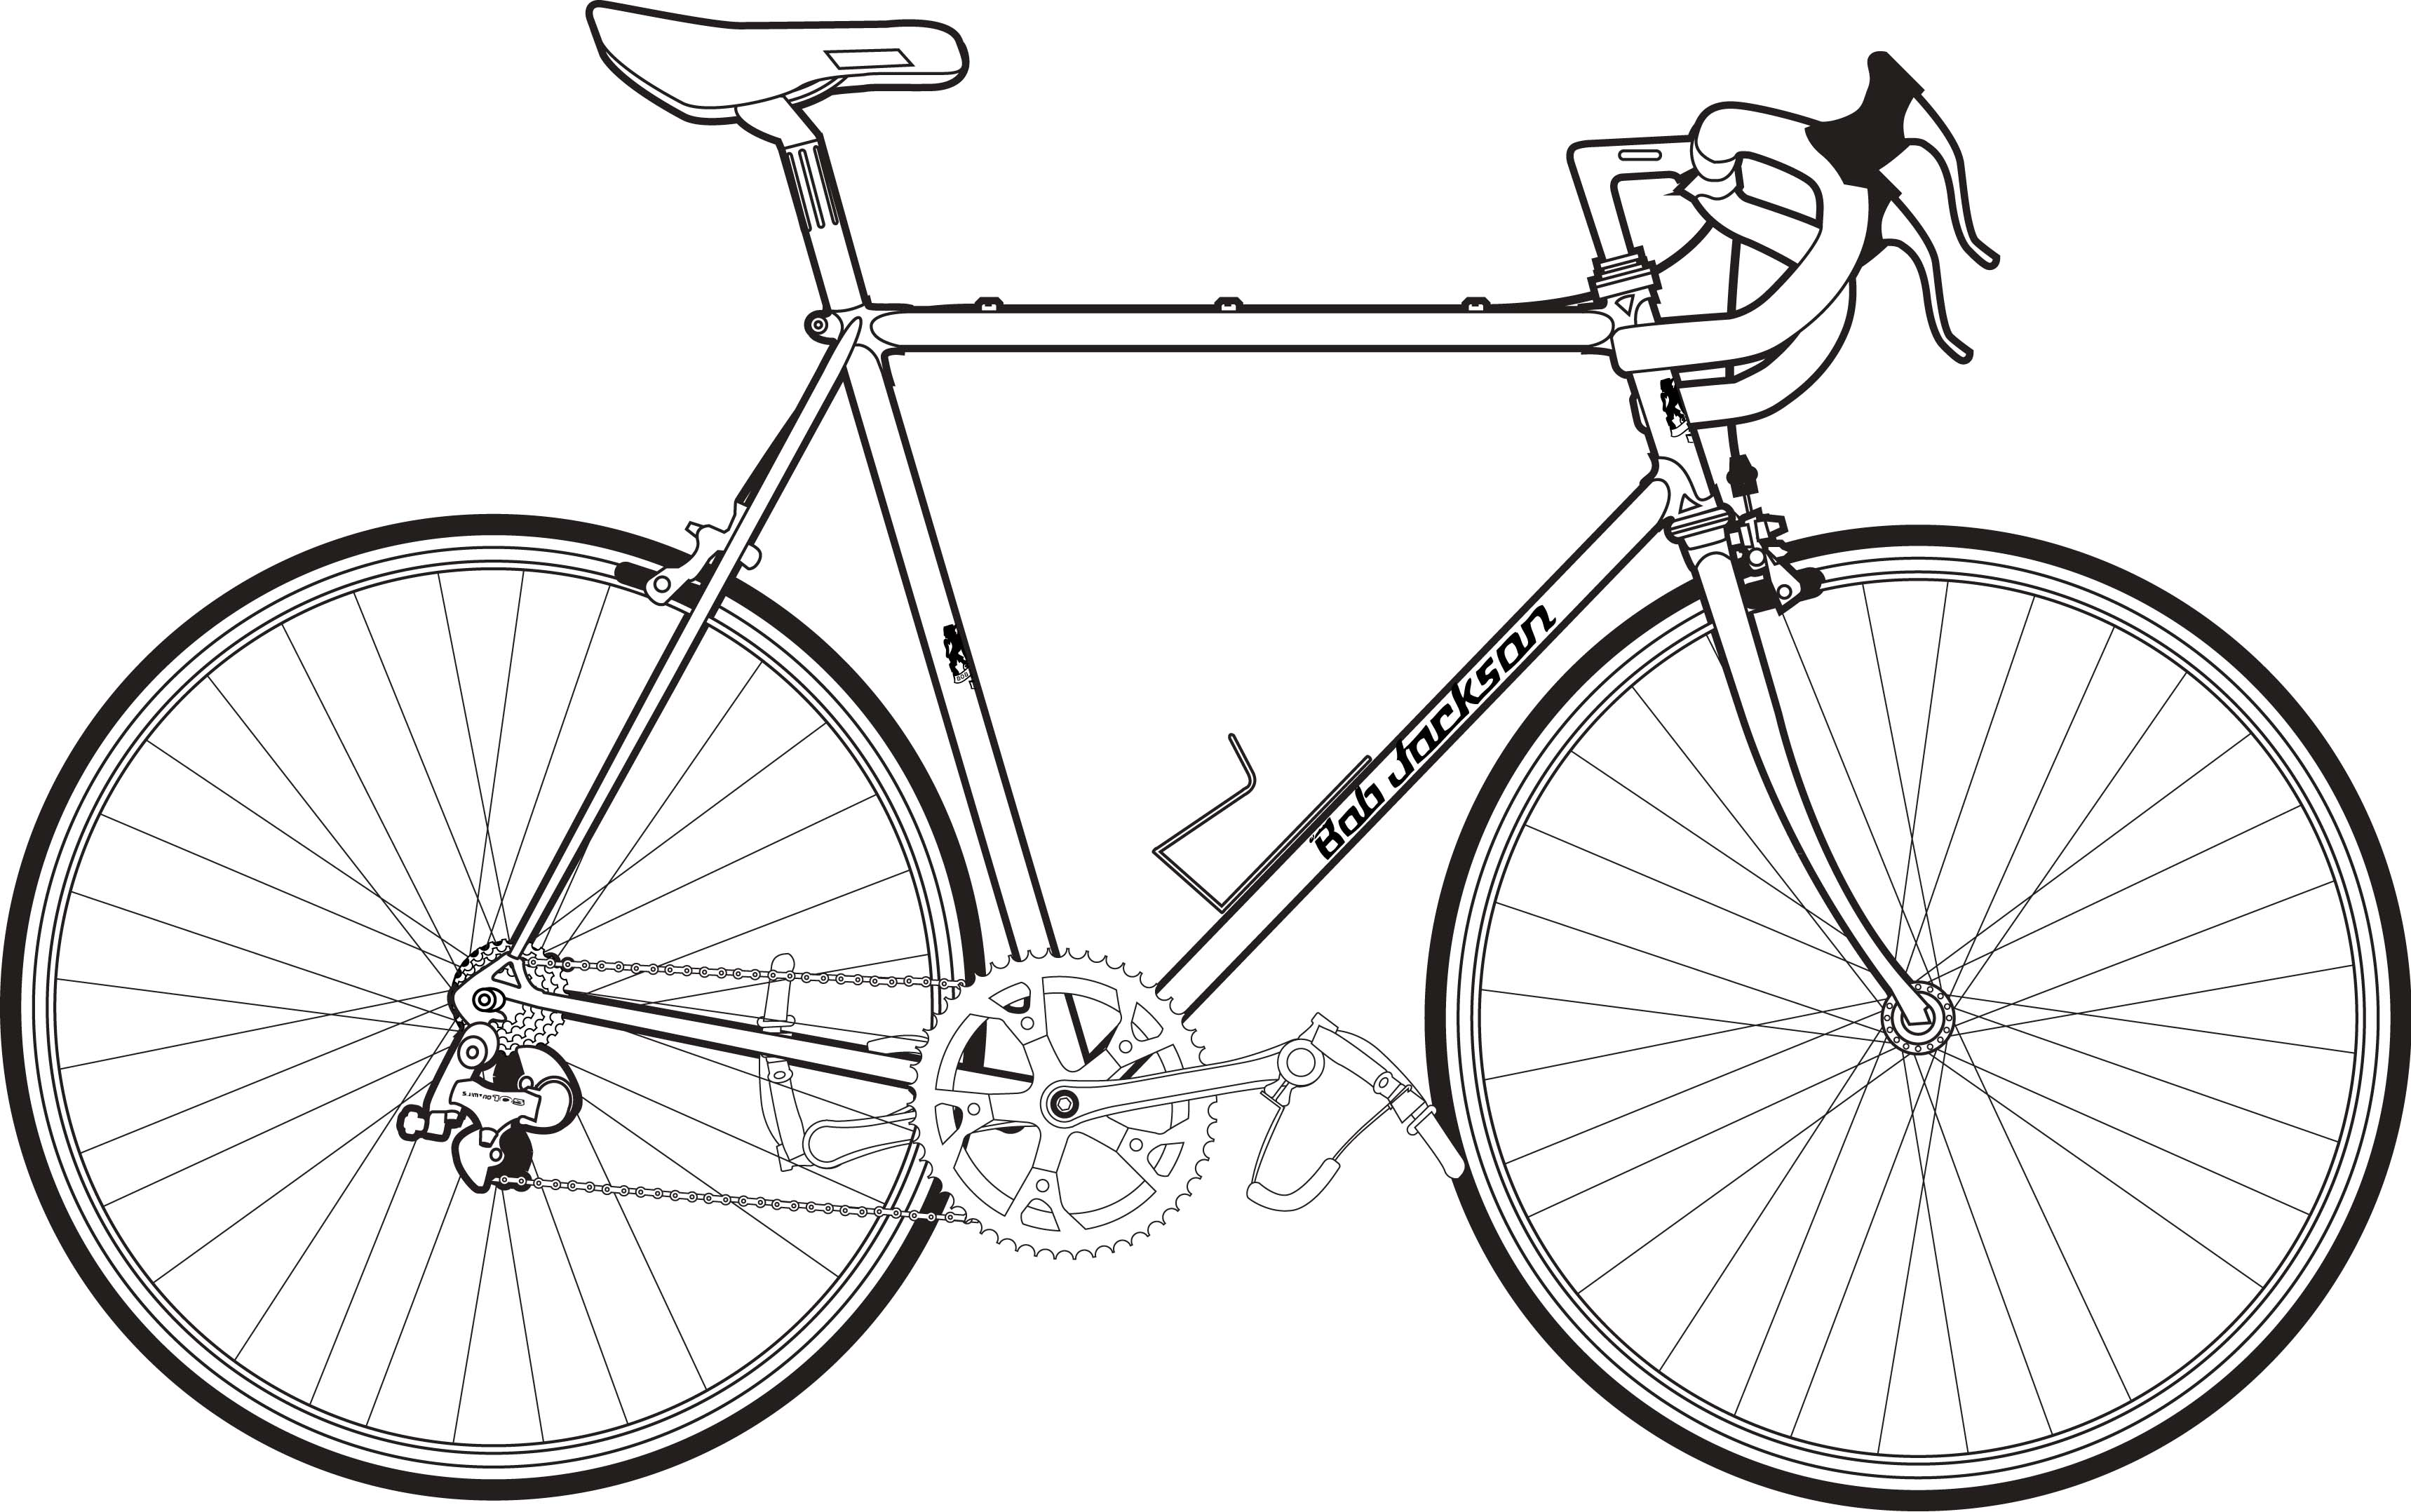 Drawn bike bicycle line #9